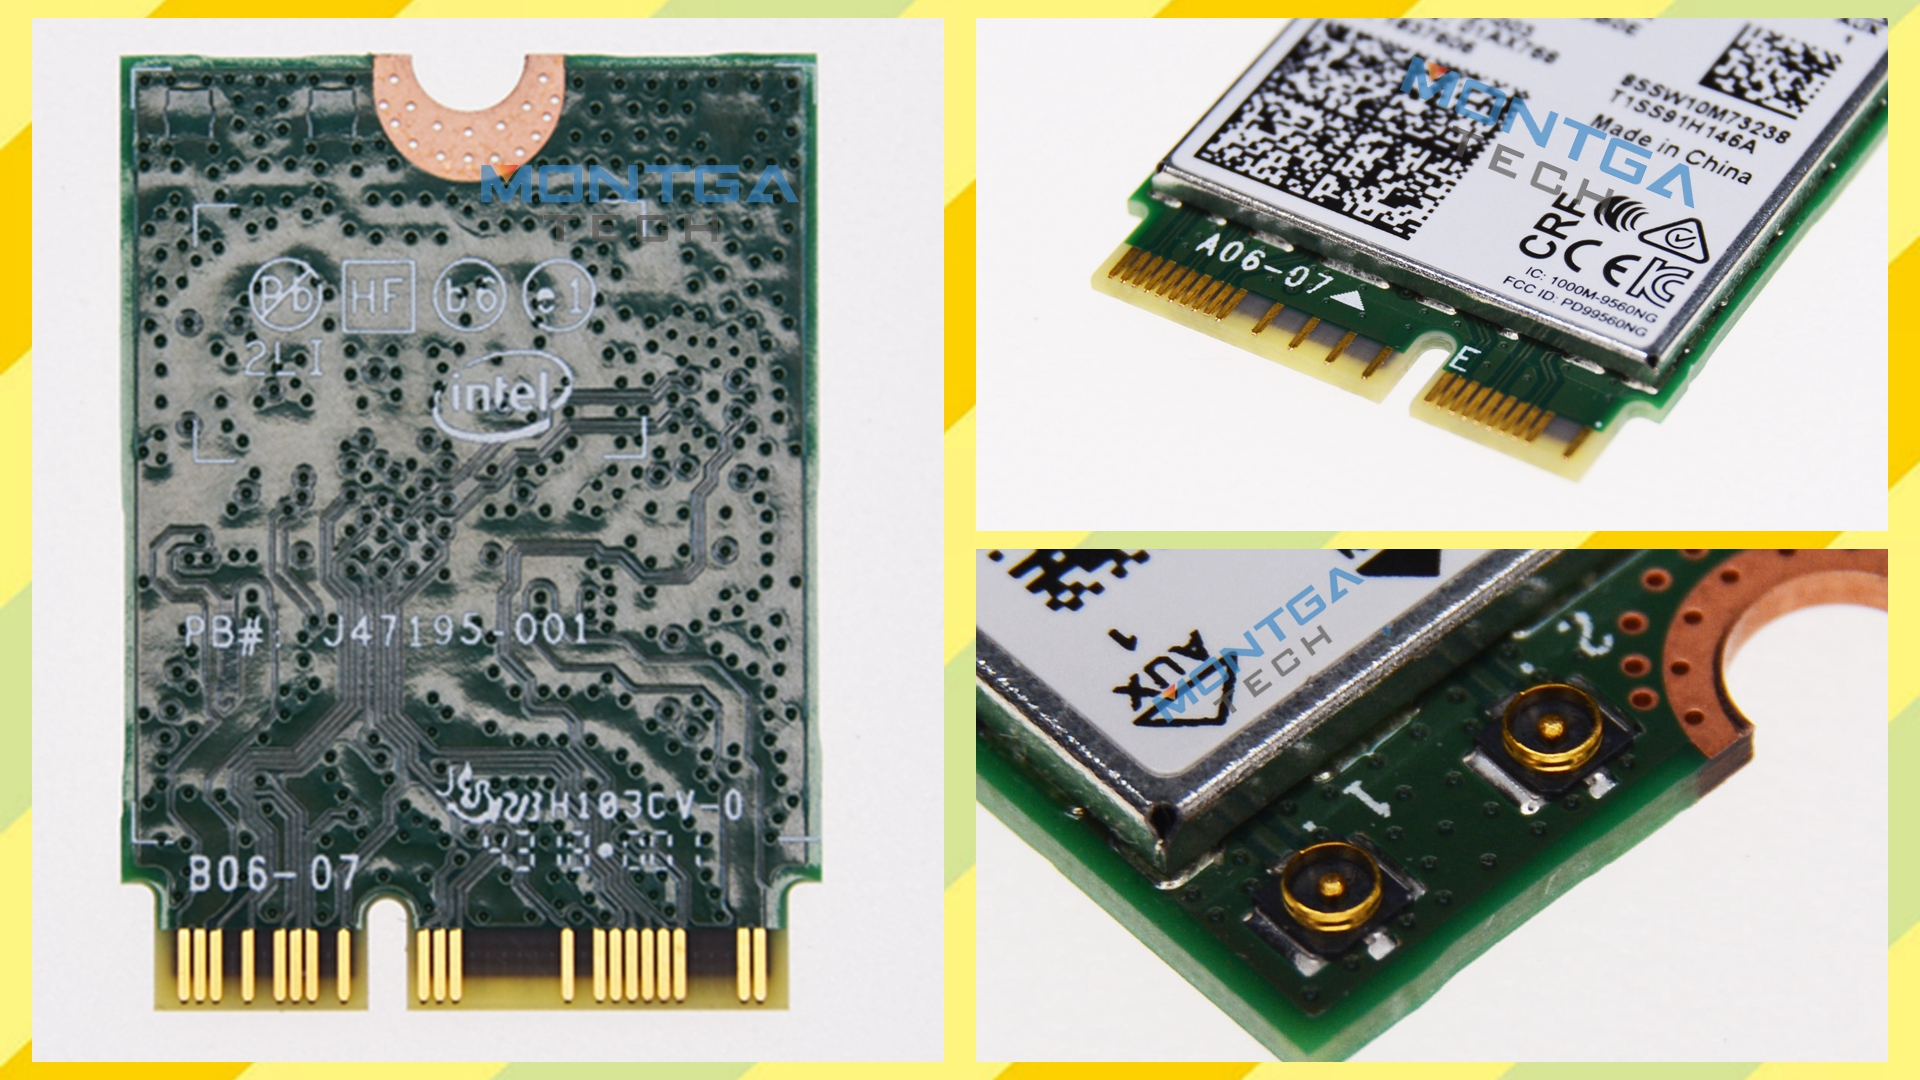 Asus UX580G WiFi card, Asus UX580G Wireless card, Asus UX580G Connection card, internal WiFi card Asus UX580G, WiFi Asus UX580G,